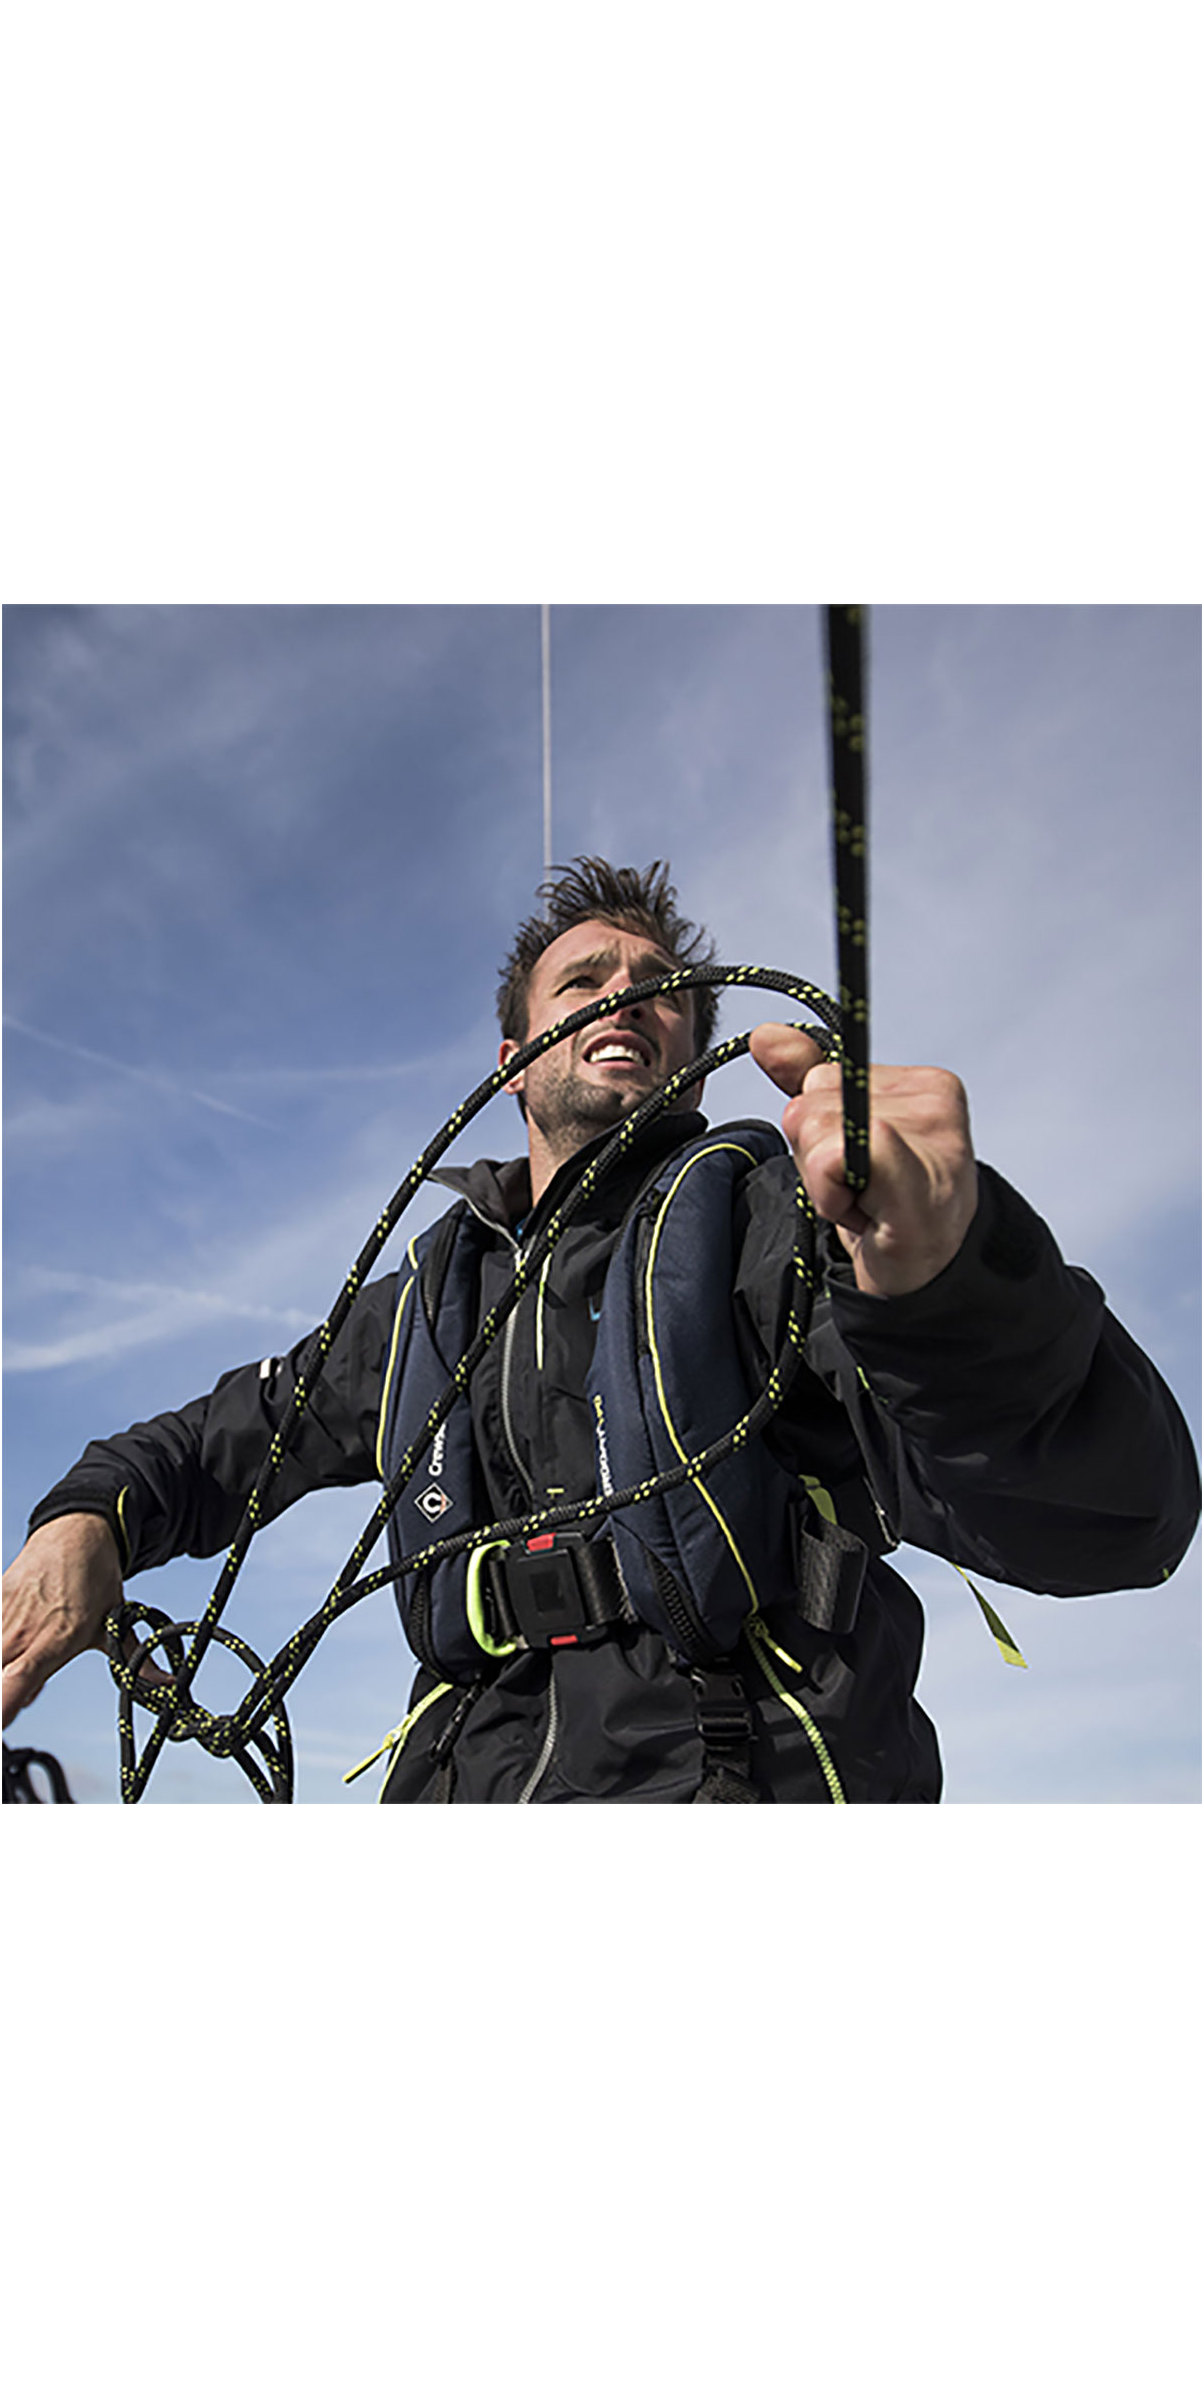 2020 Crewsaver ErgoFit+ 190N Hammar Lifejacket With Harness, Light & Hood Navy 9155NBGHP